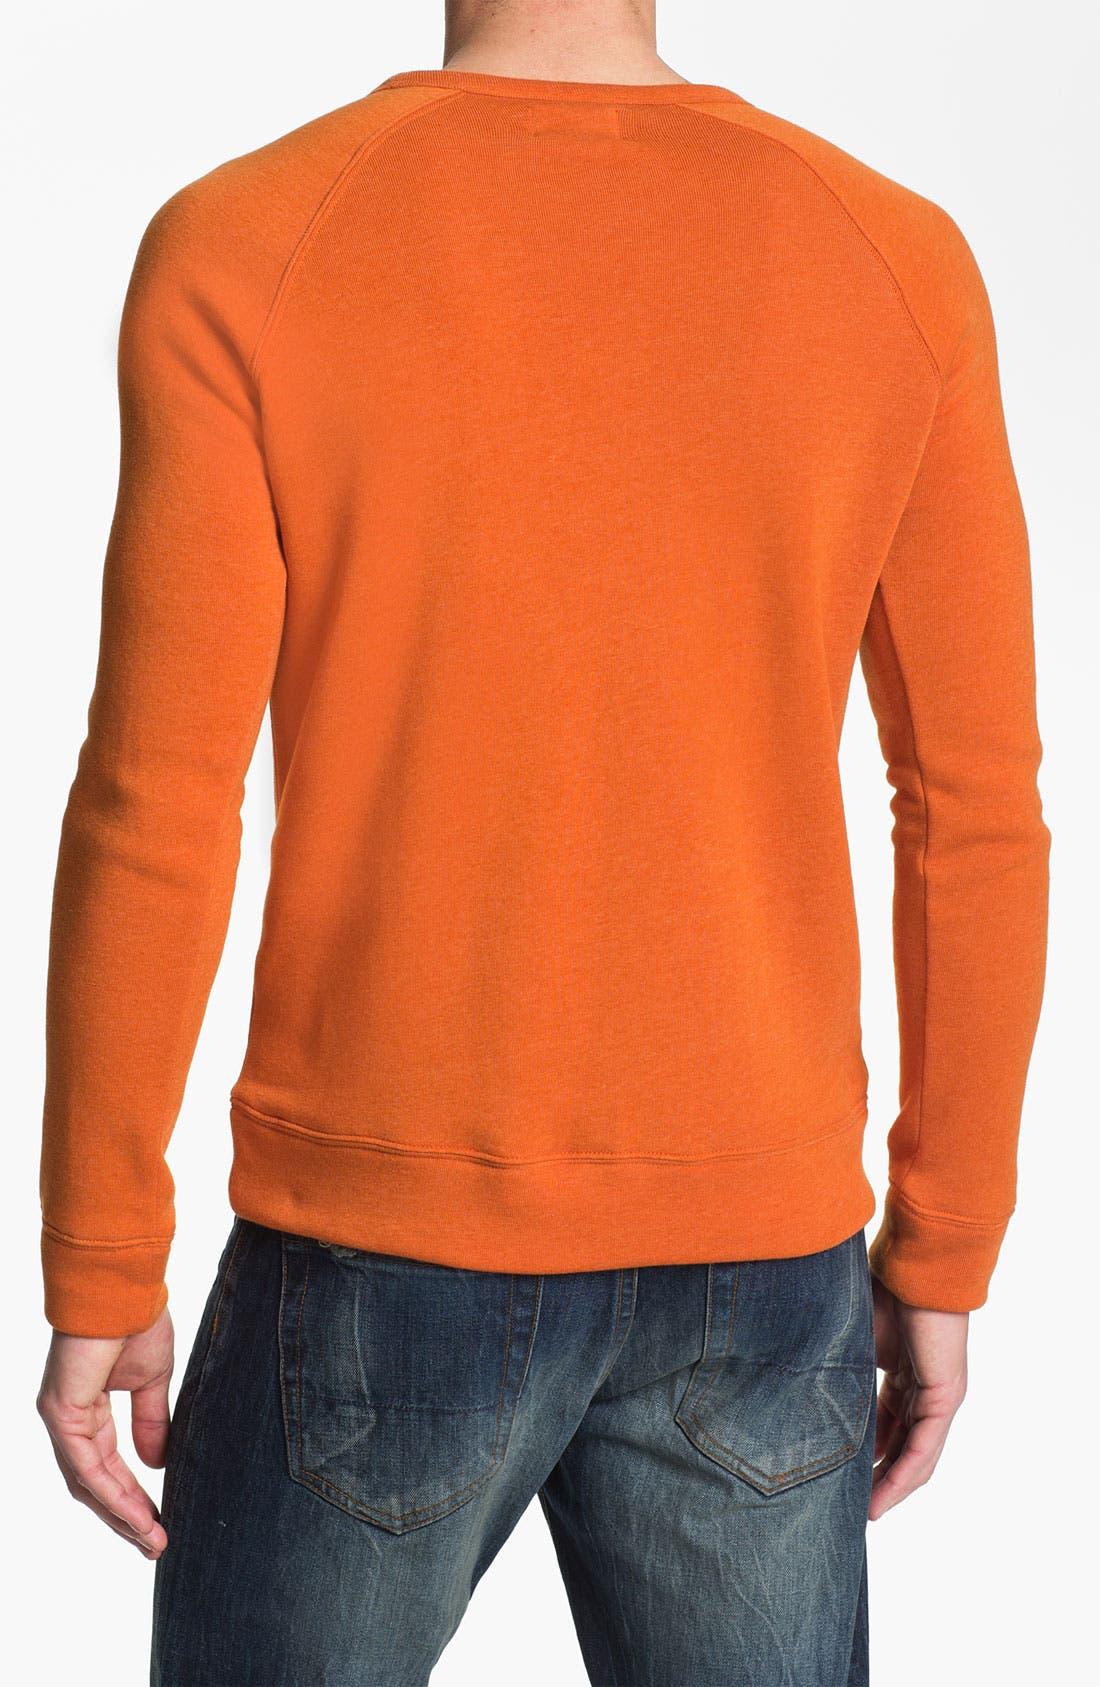 Alternate Image 2  - Obey Lofty Creature Comforts Crewneck Sweatshirt